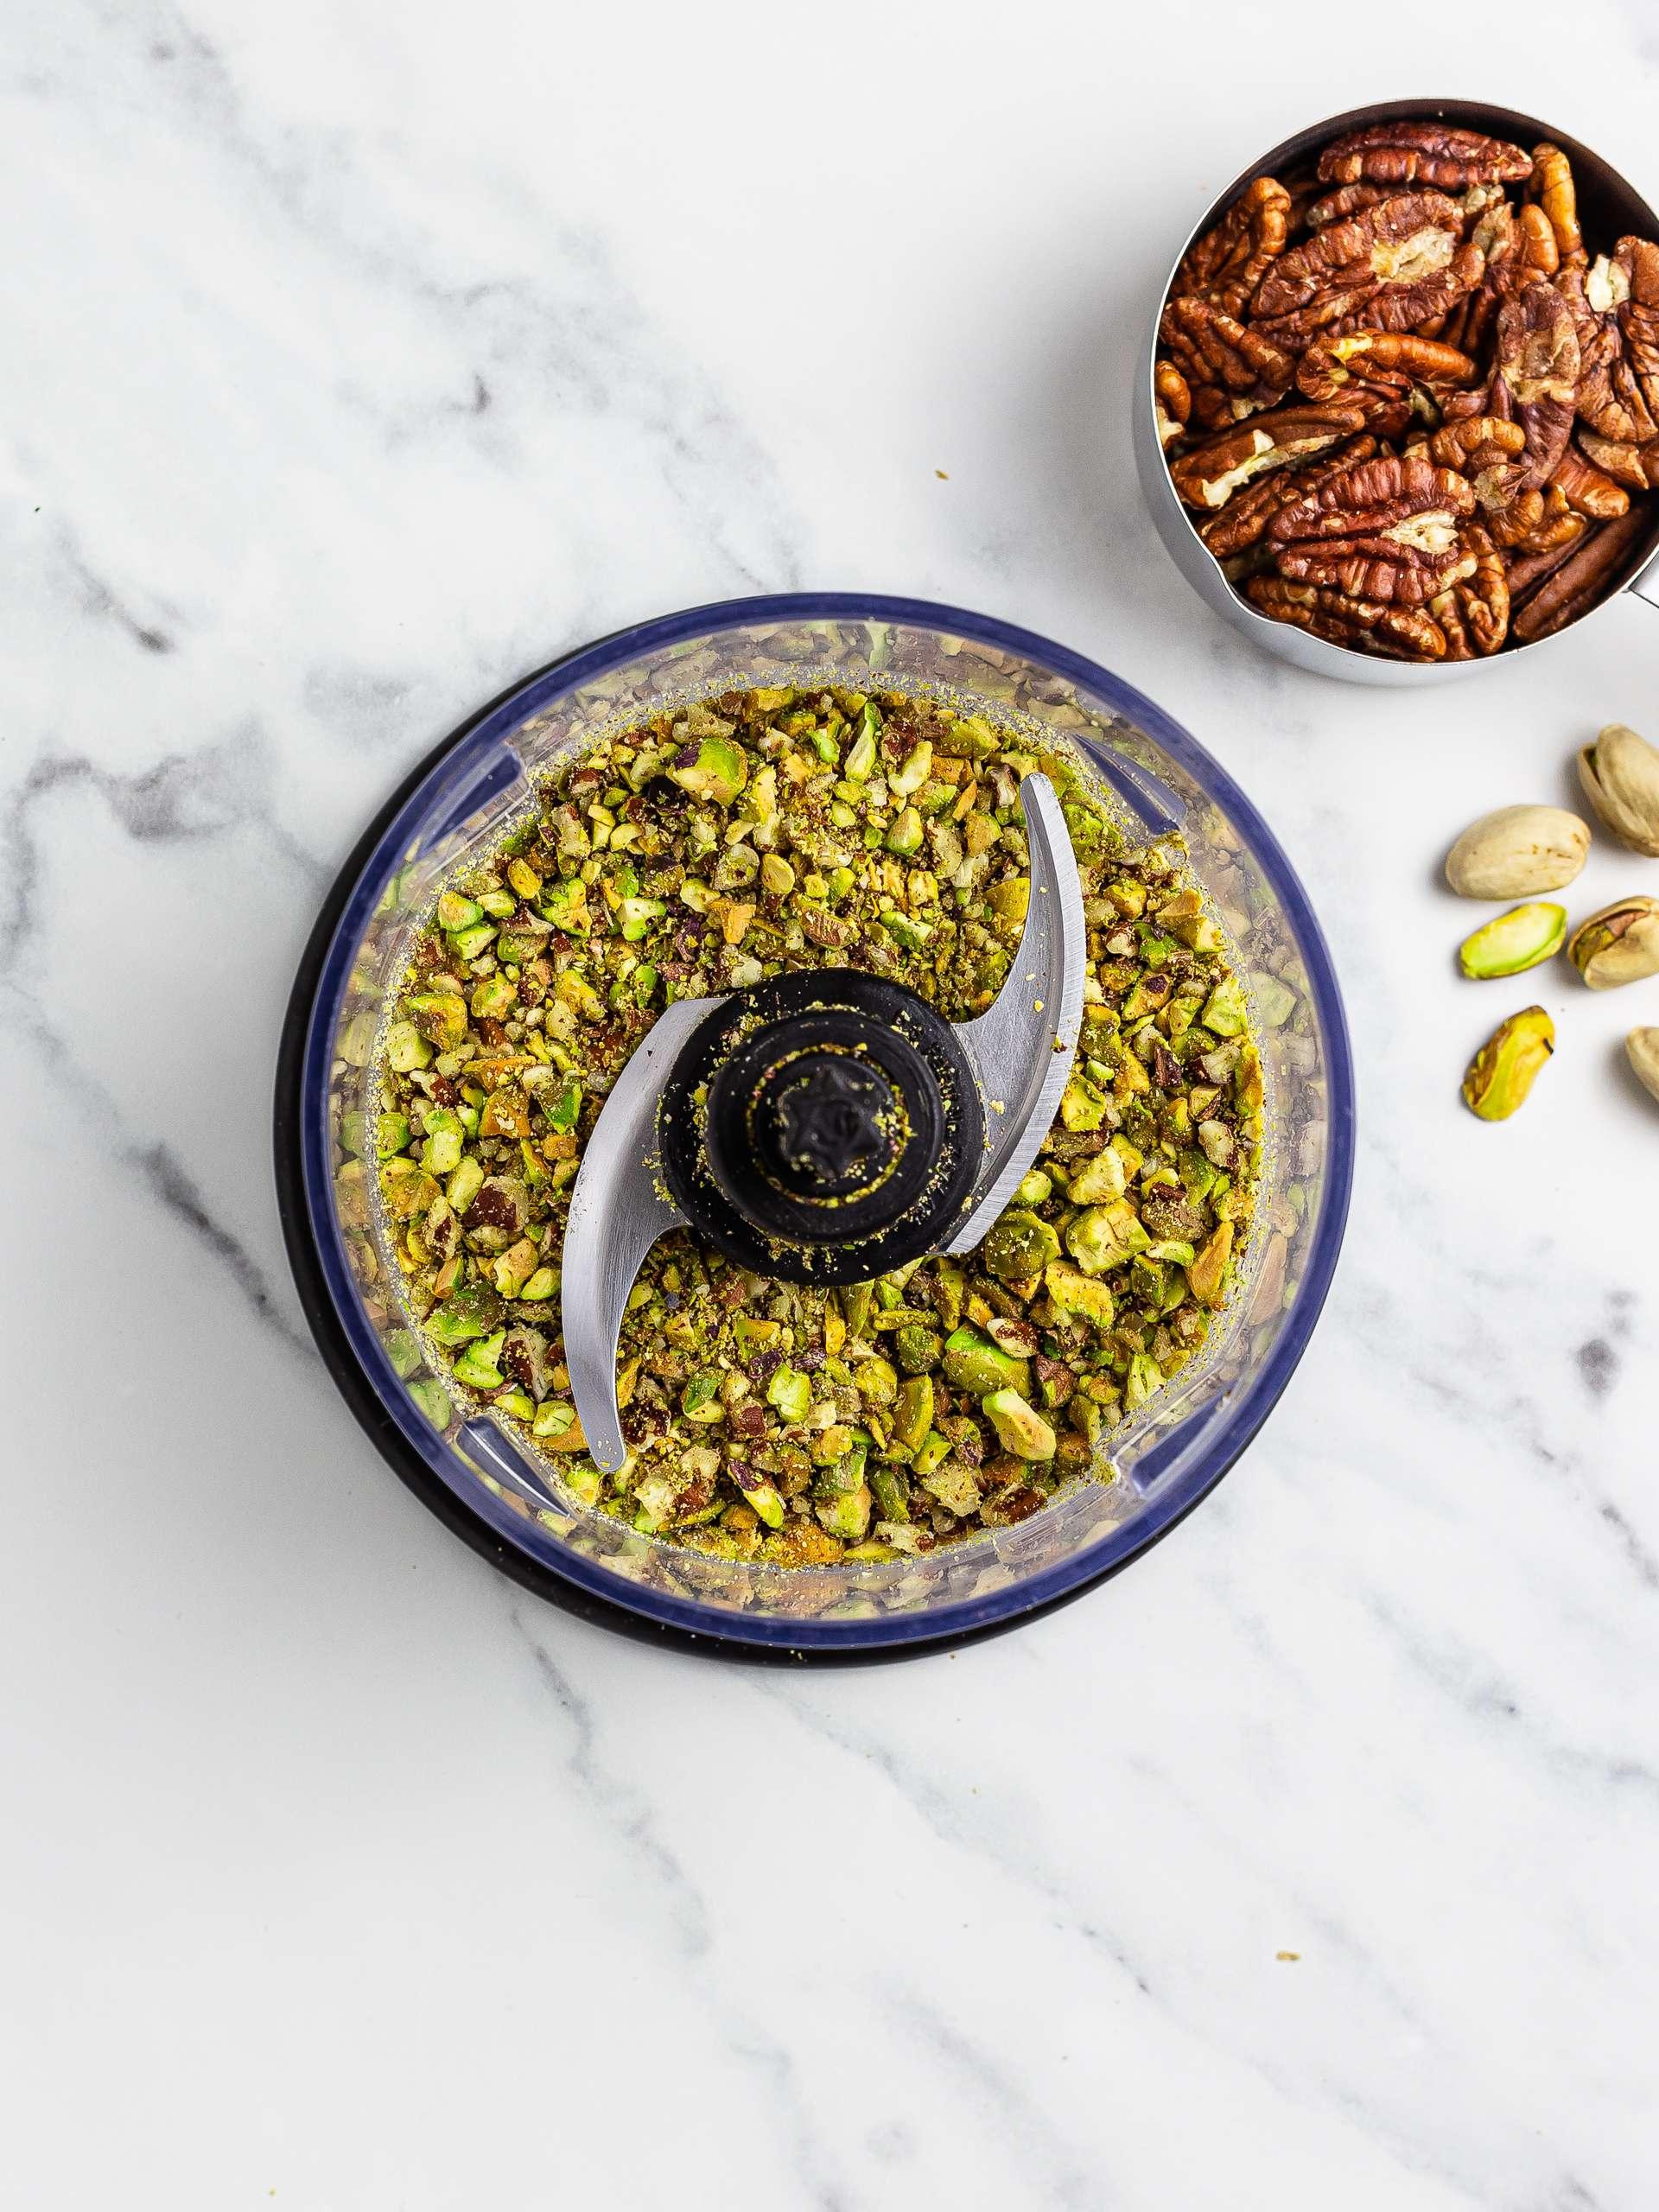 ground pistachios and pecans